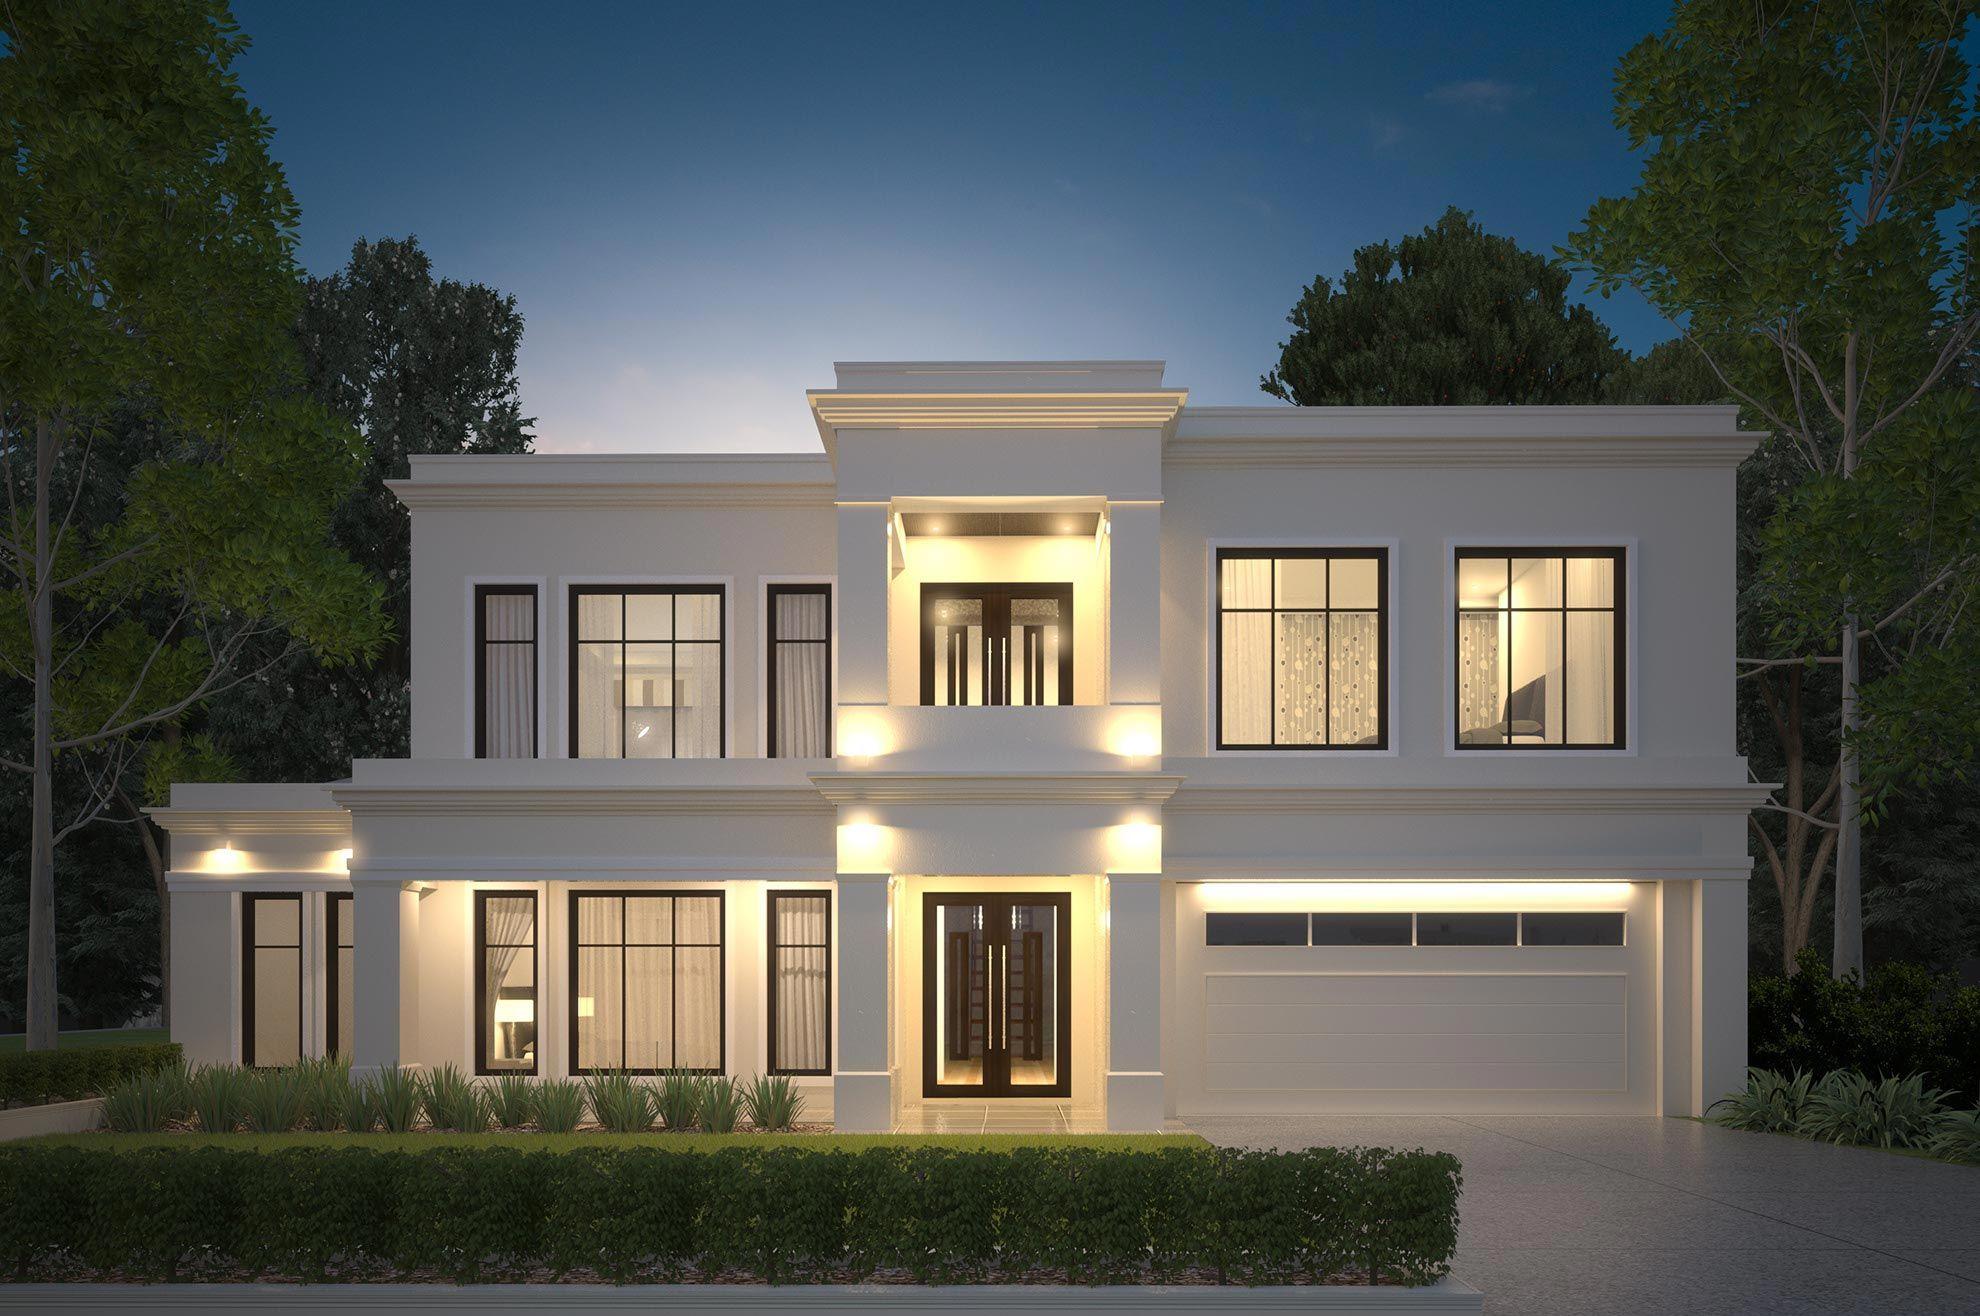 The Palladium 510 Luxury House Design By Somerset Morgan